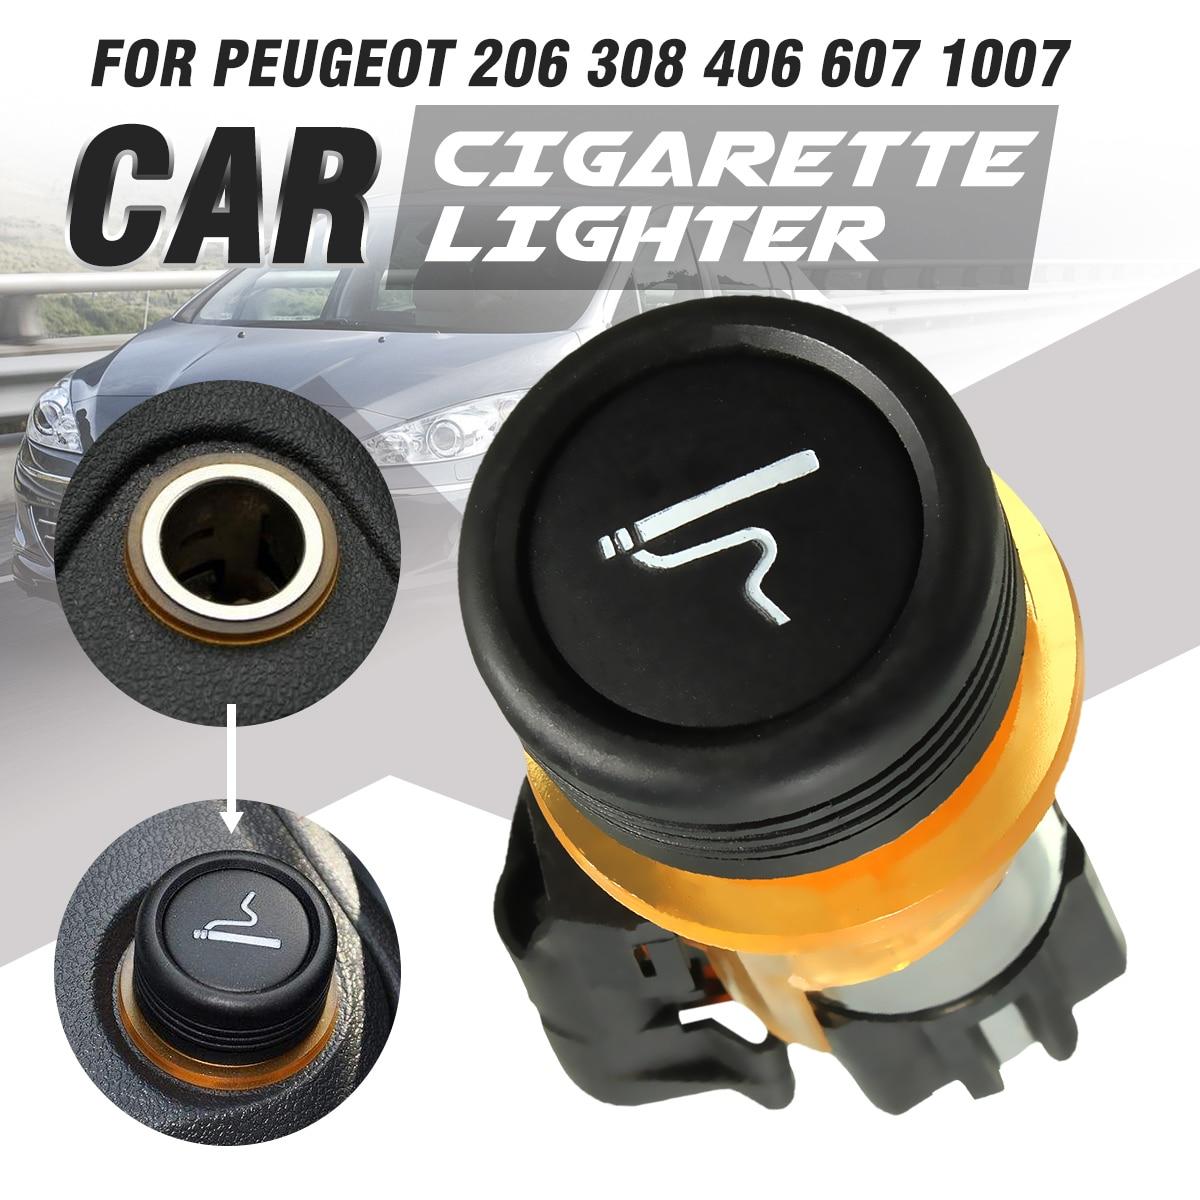 12 v Voiture Allume-cigare Logement Cig Socket Pour Peugeot CC SW 206 308 406 607 1007